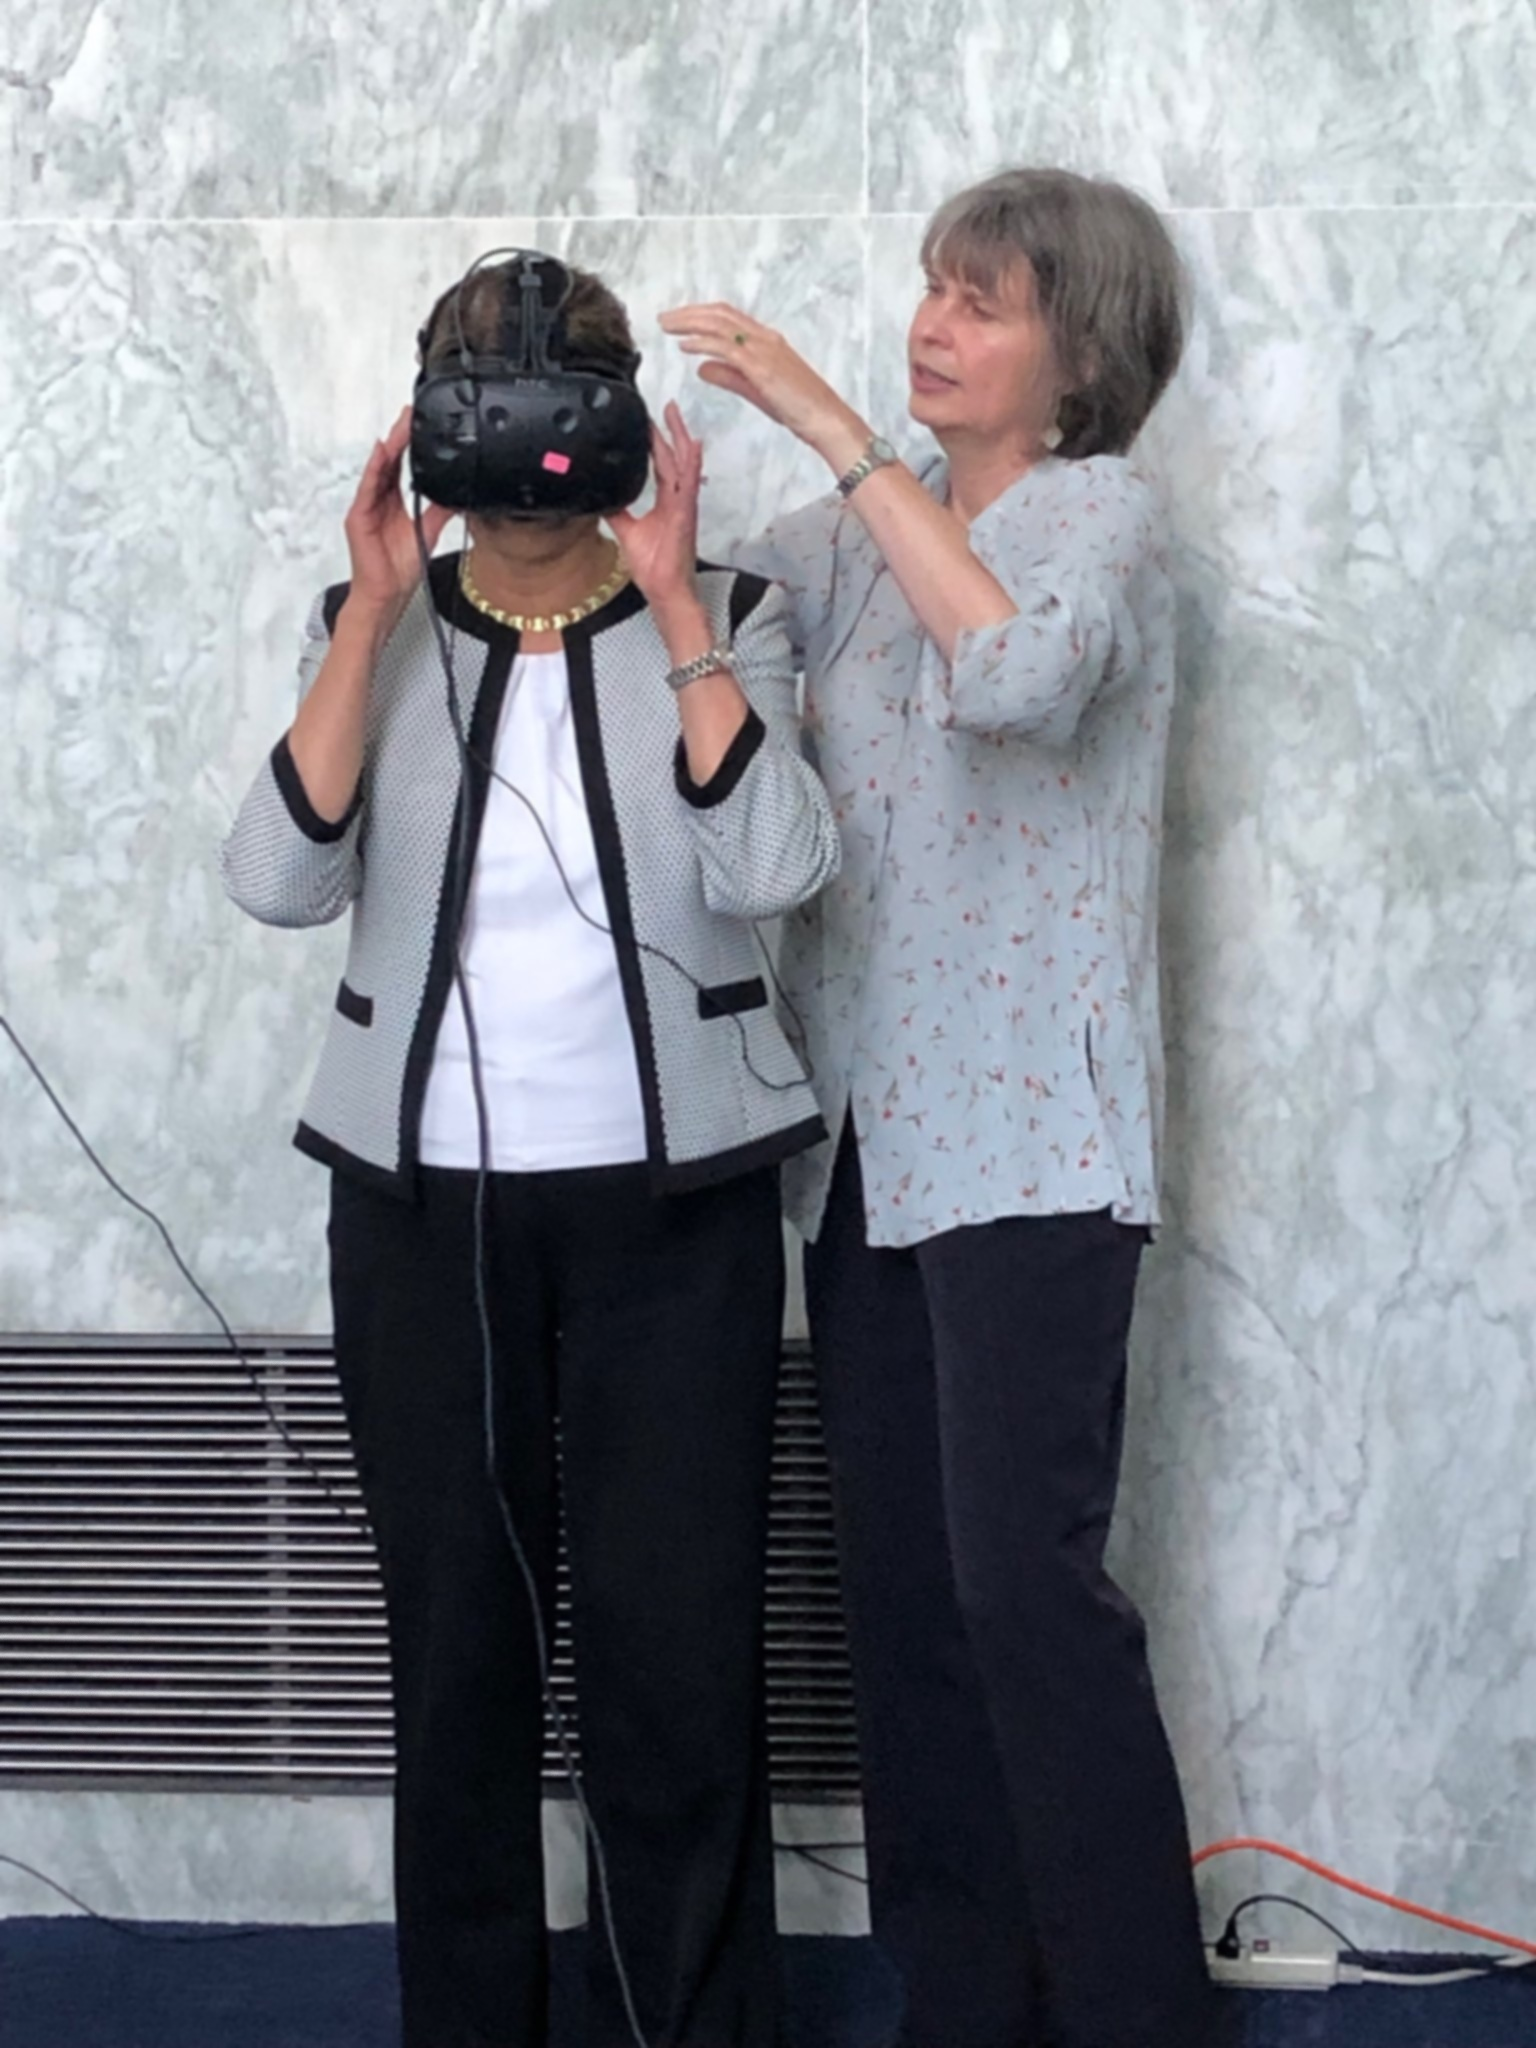 Dr. Jodie Plumert helps Rep. Lucille Roybal-Allard (D-CA) with a VR headset